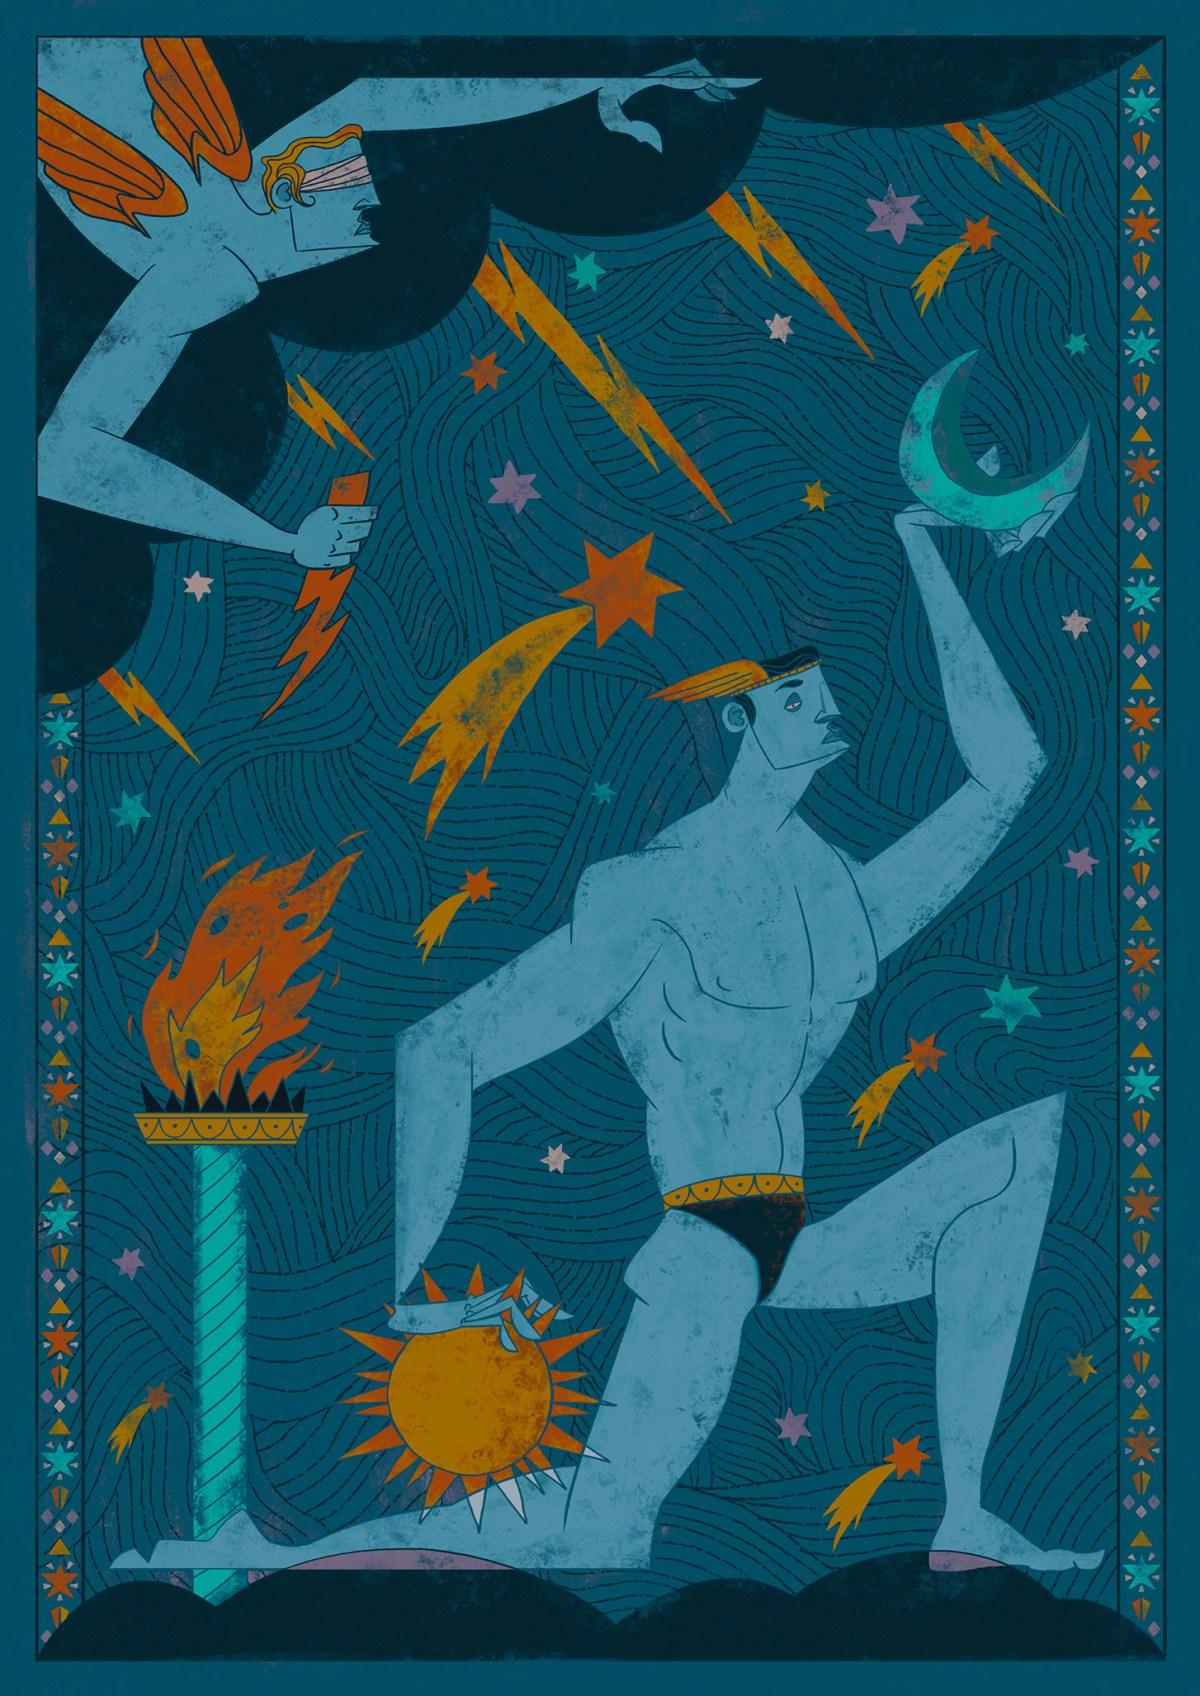 editorial illustrations -Mete Kaplan Eker